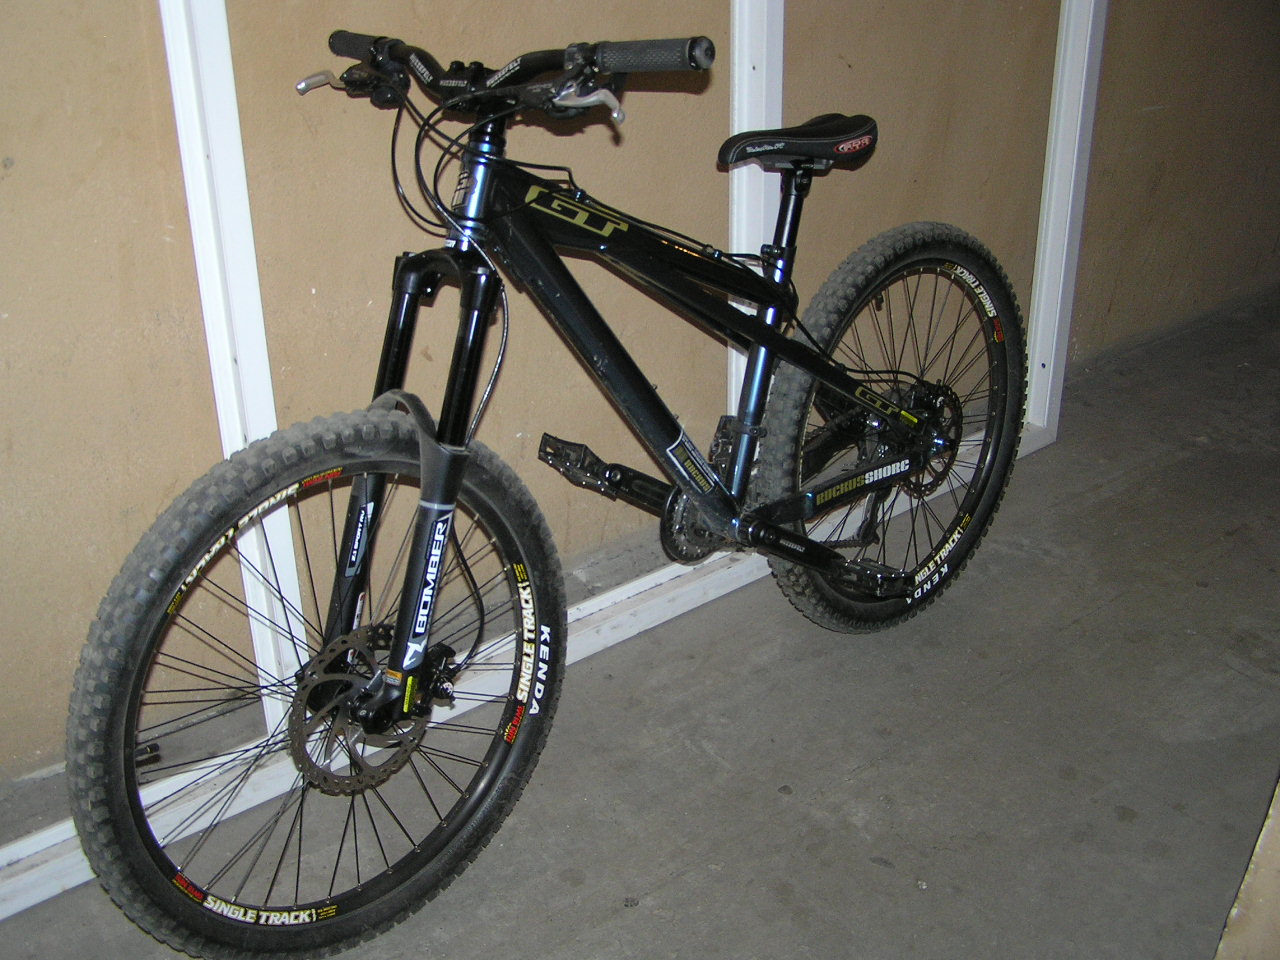 Подборка дрочка, старая жопа на велосипеде